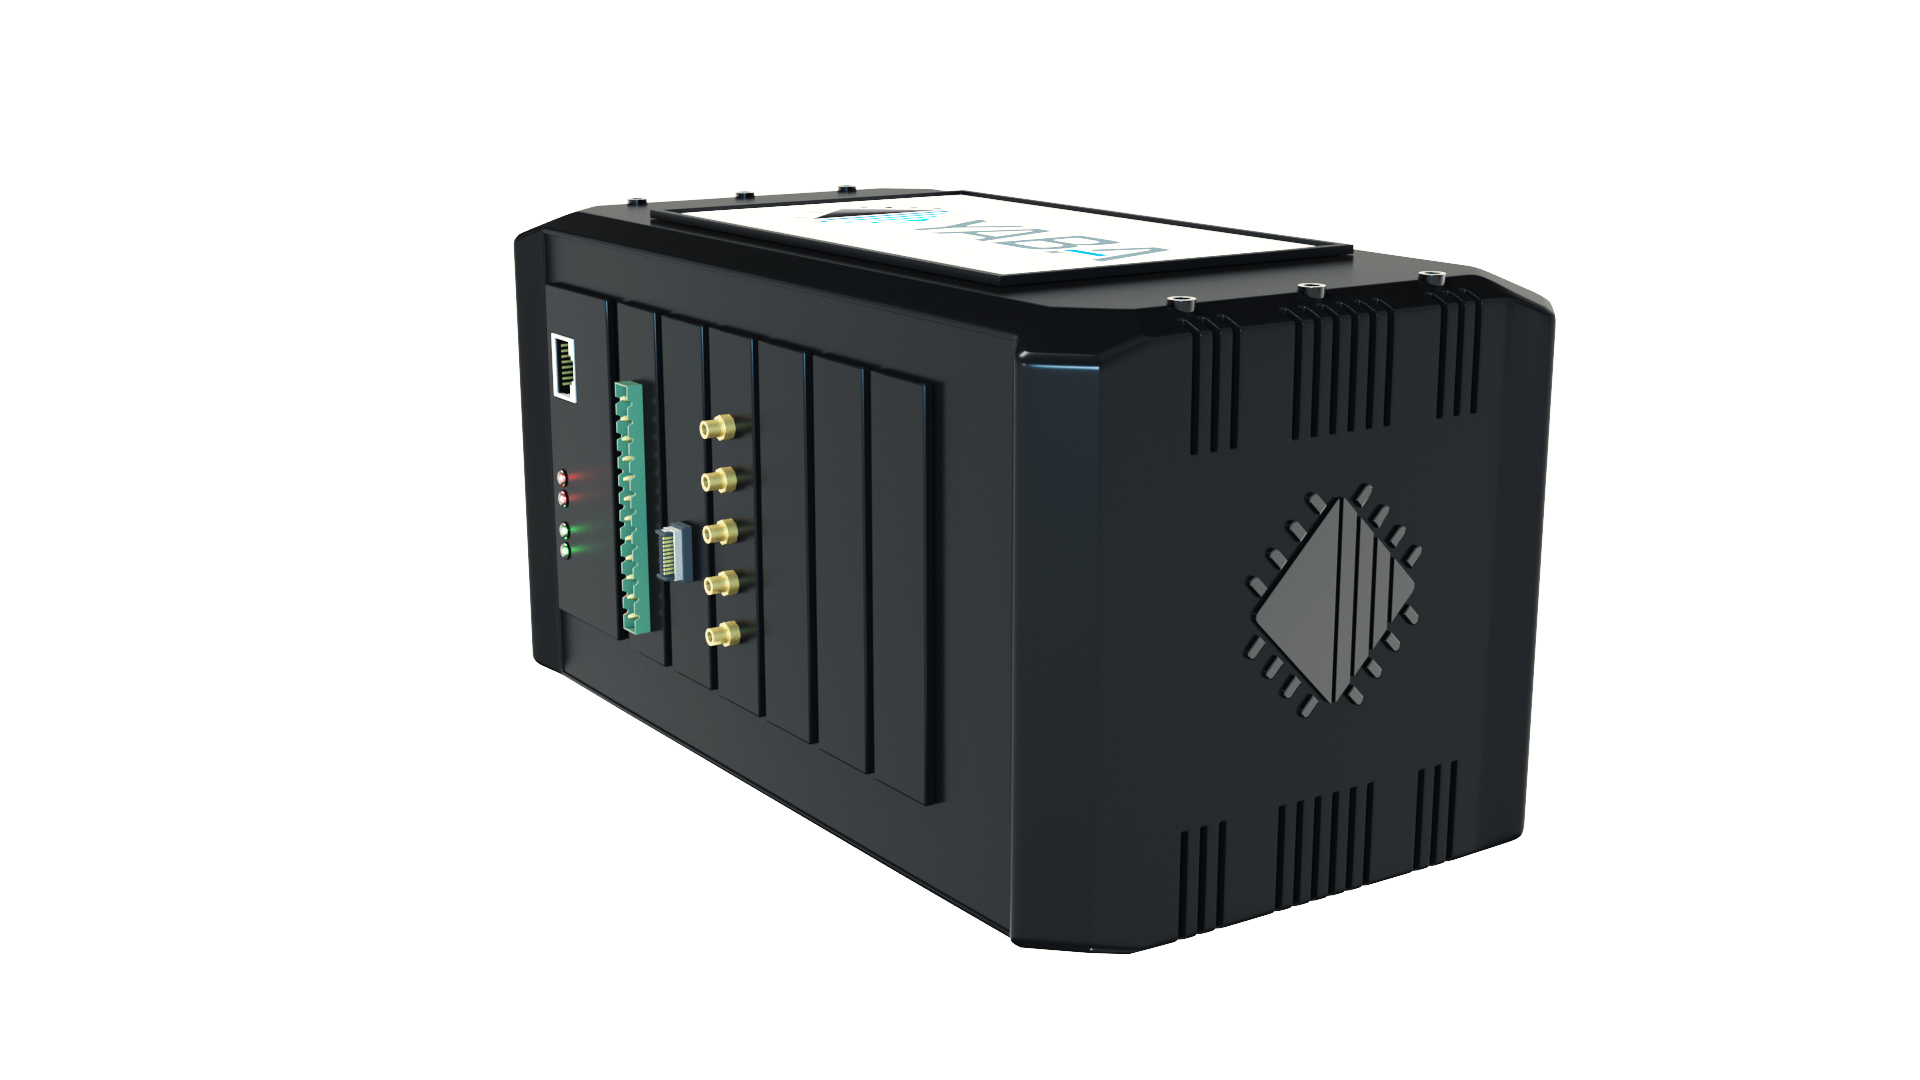 Yaba CubeBox